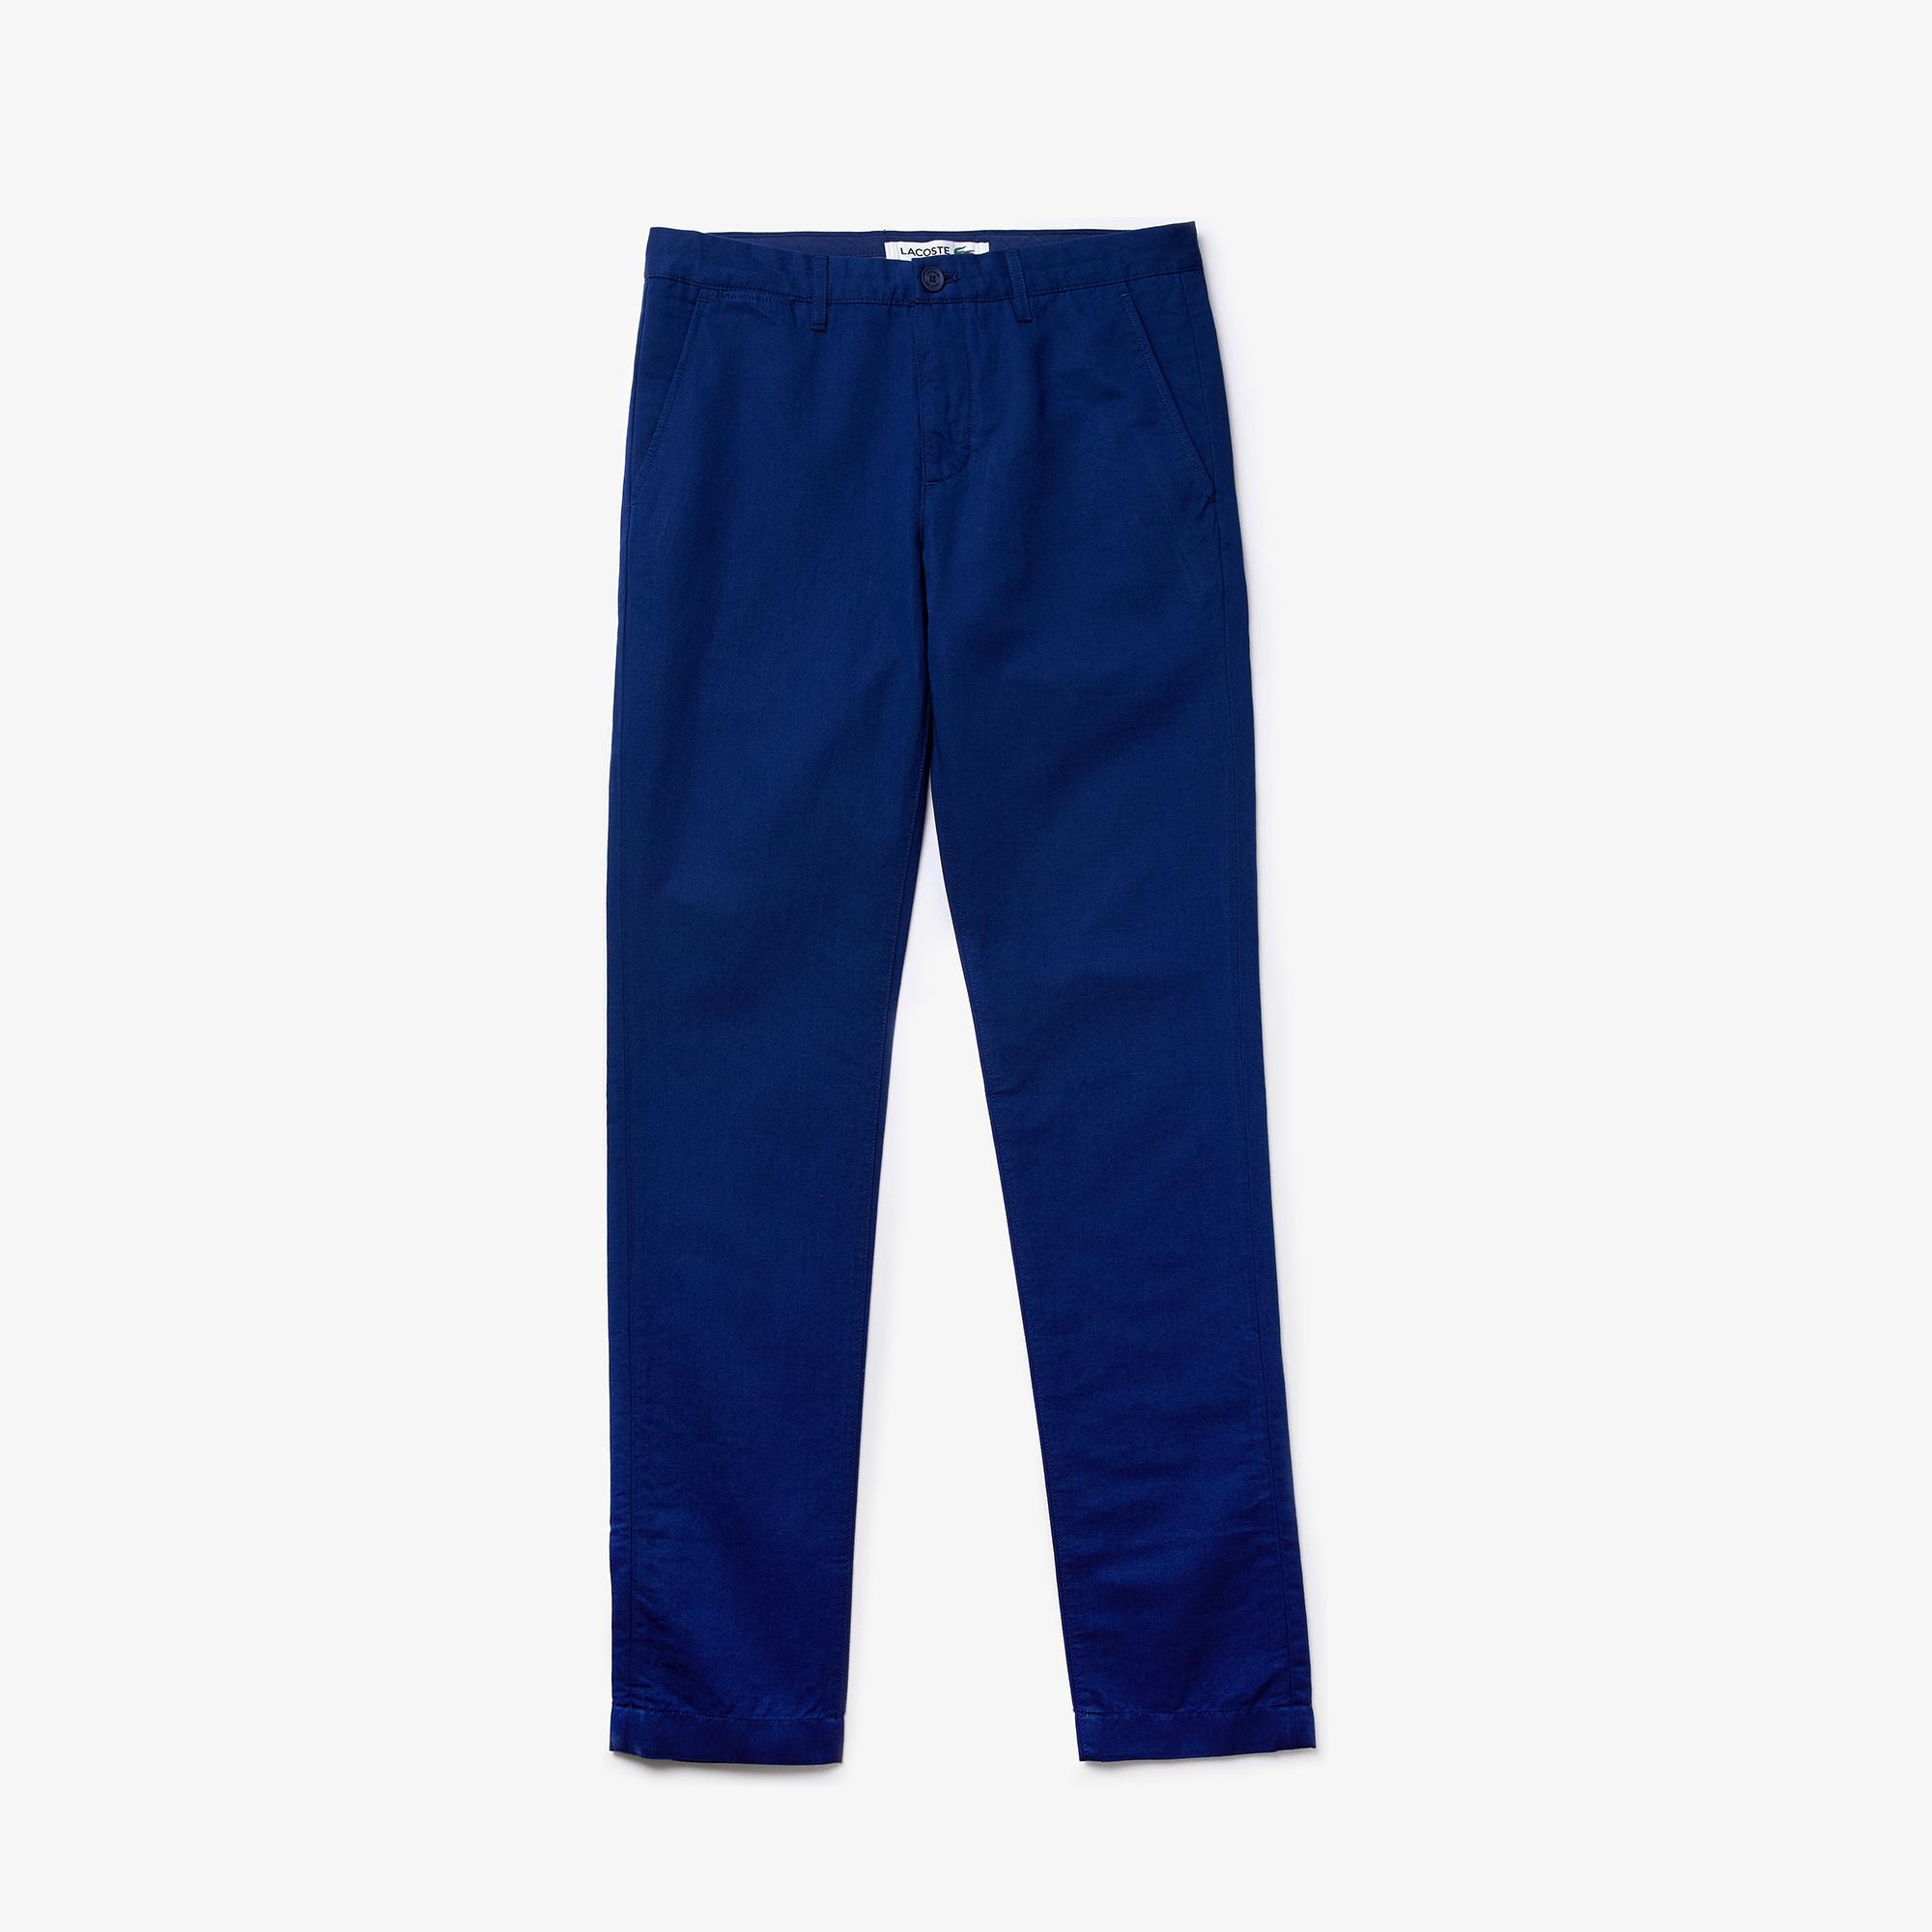 Lacoste Men's Cotton-Linen Chinos